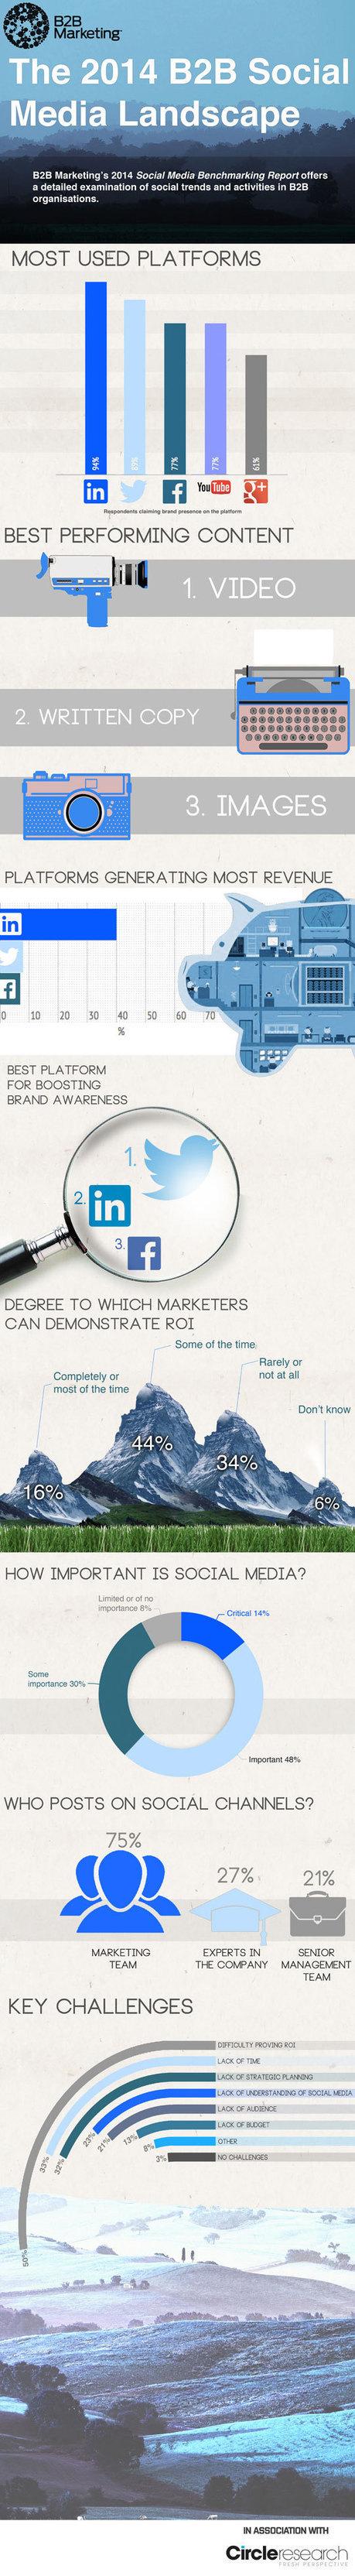 The 2014 B2B Social Media Landscape   Contenus Marketing BtoB   Scoop.it